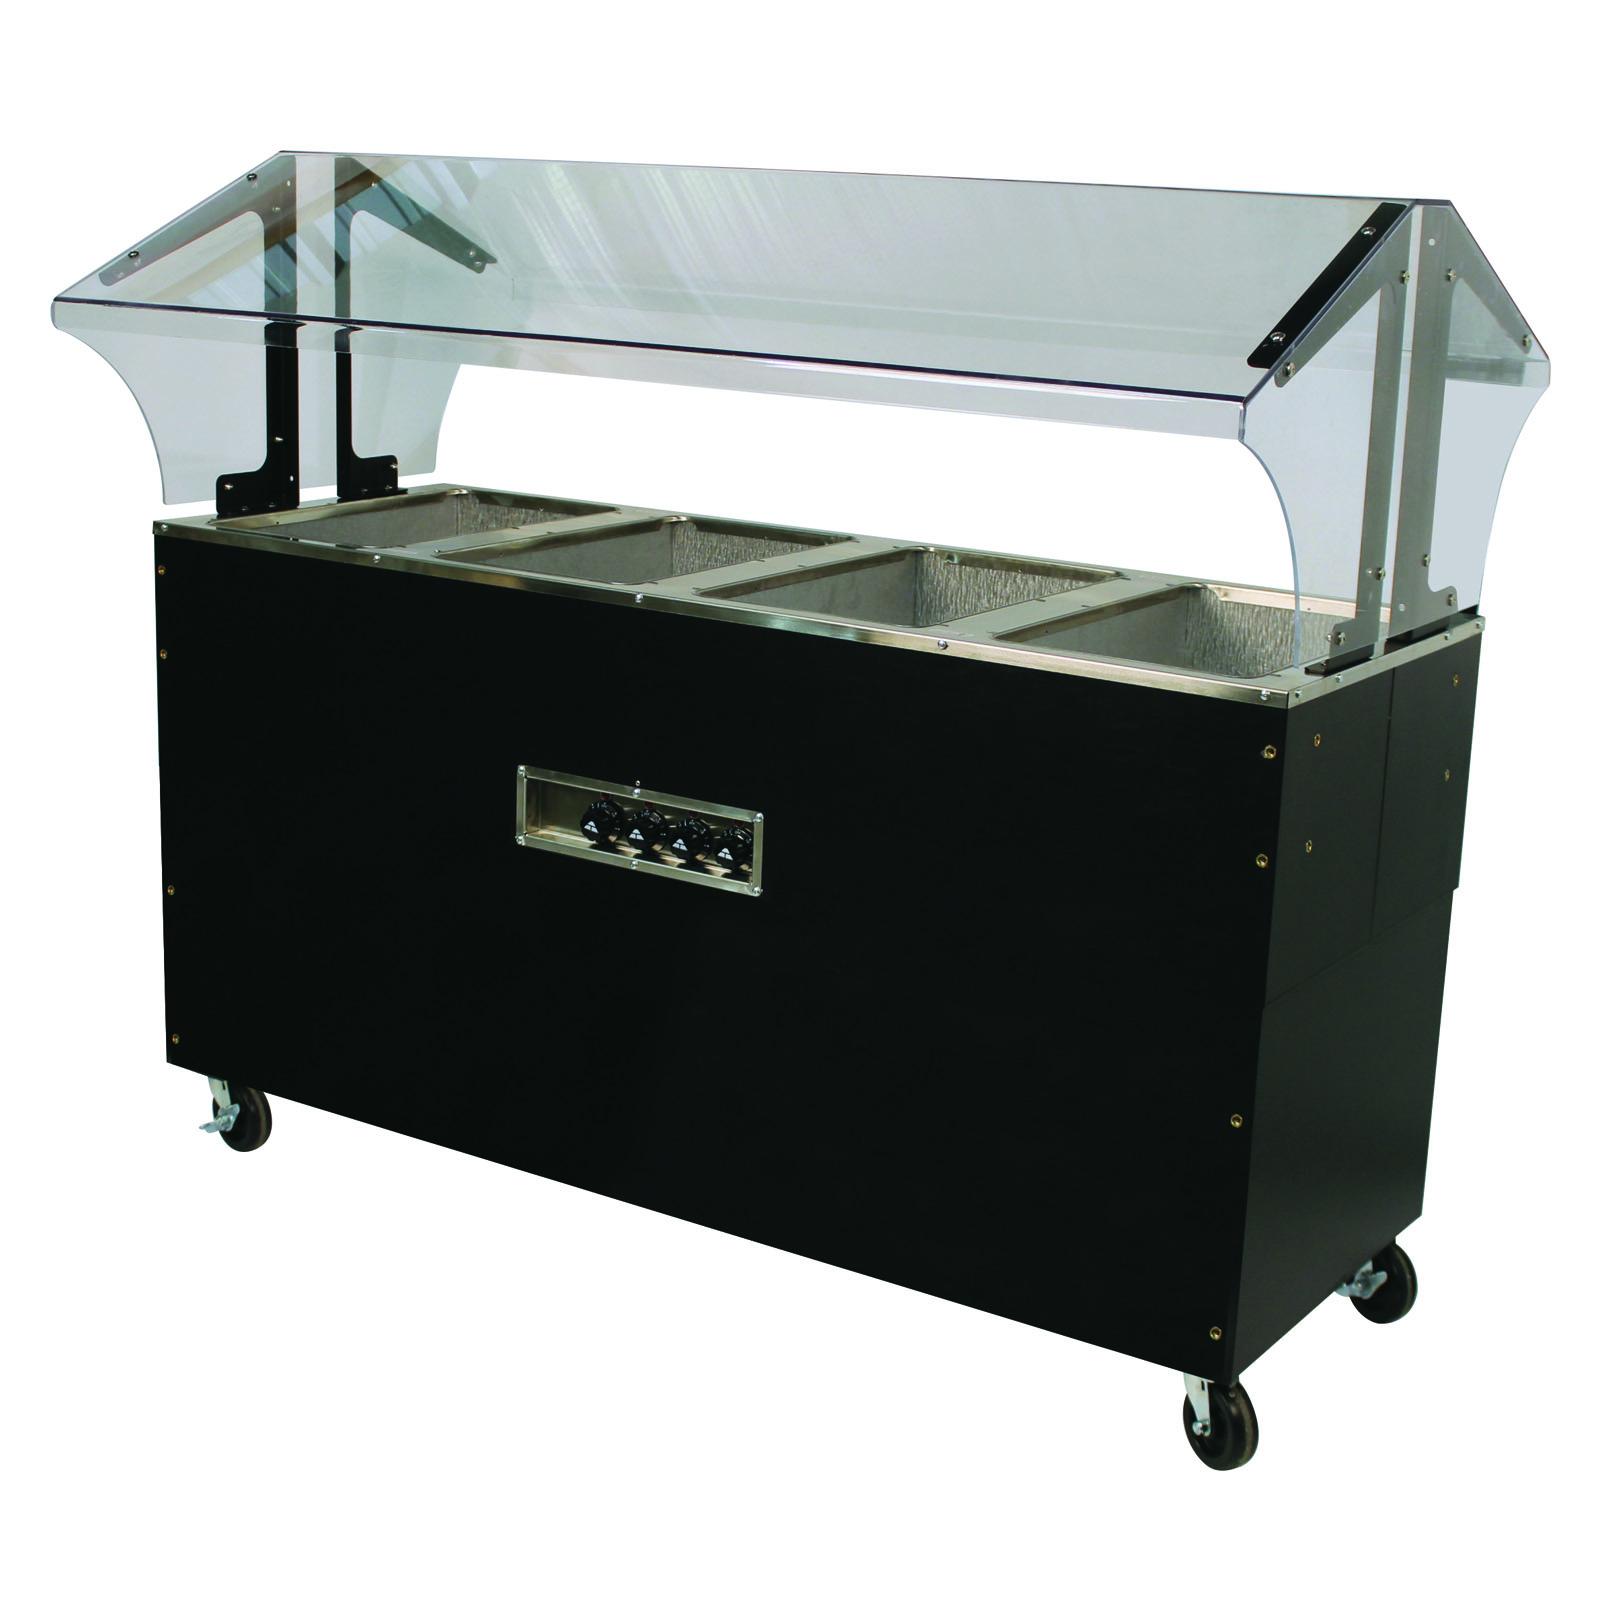 Advance Tabco B4-120-B-S-SB serving counter, hot food, electric